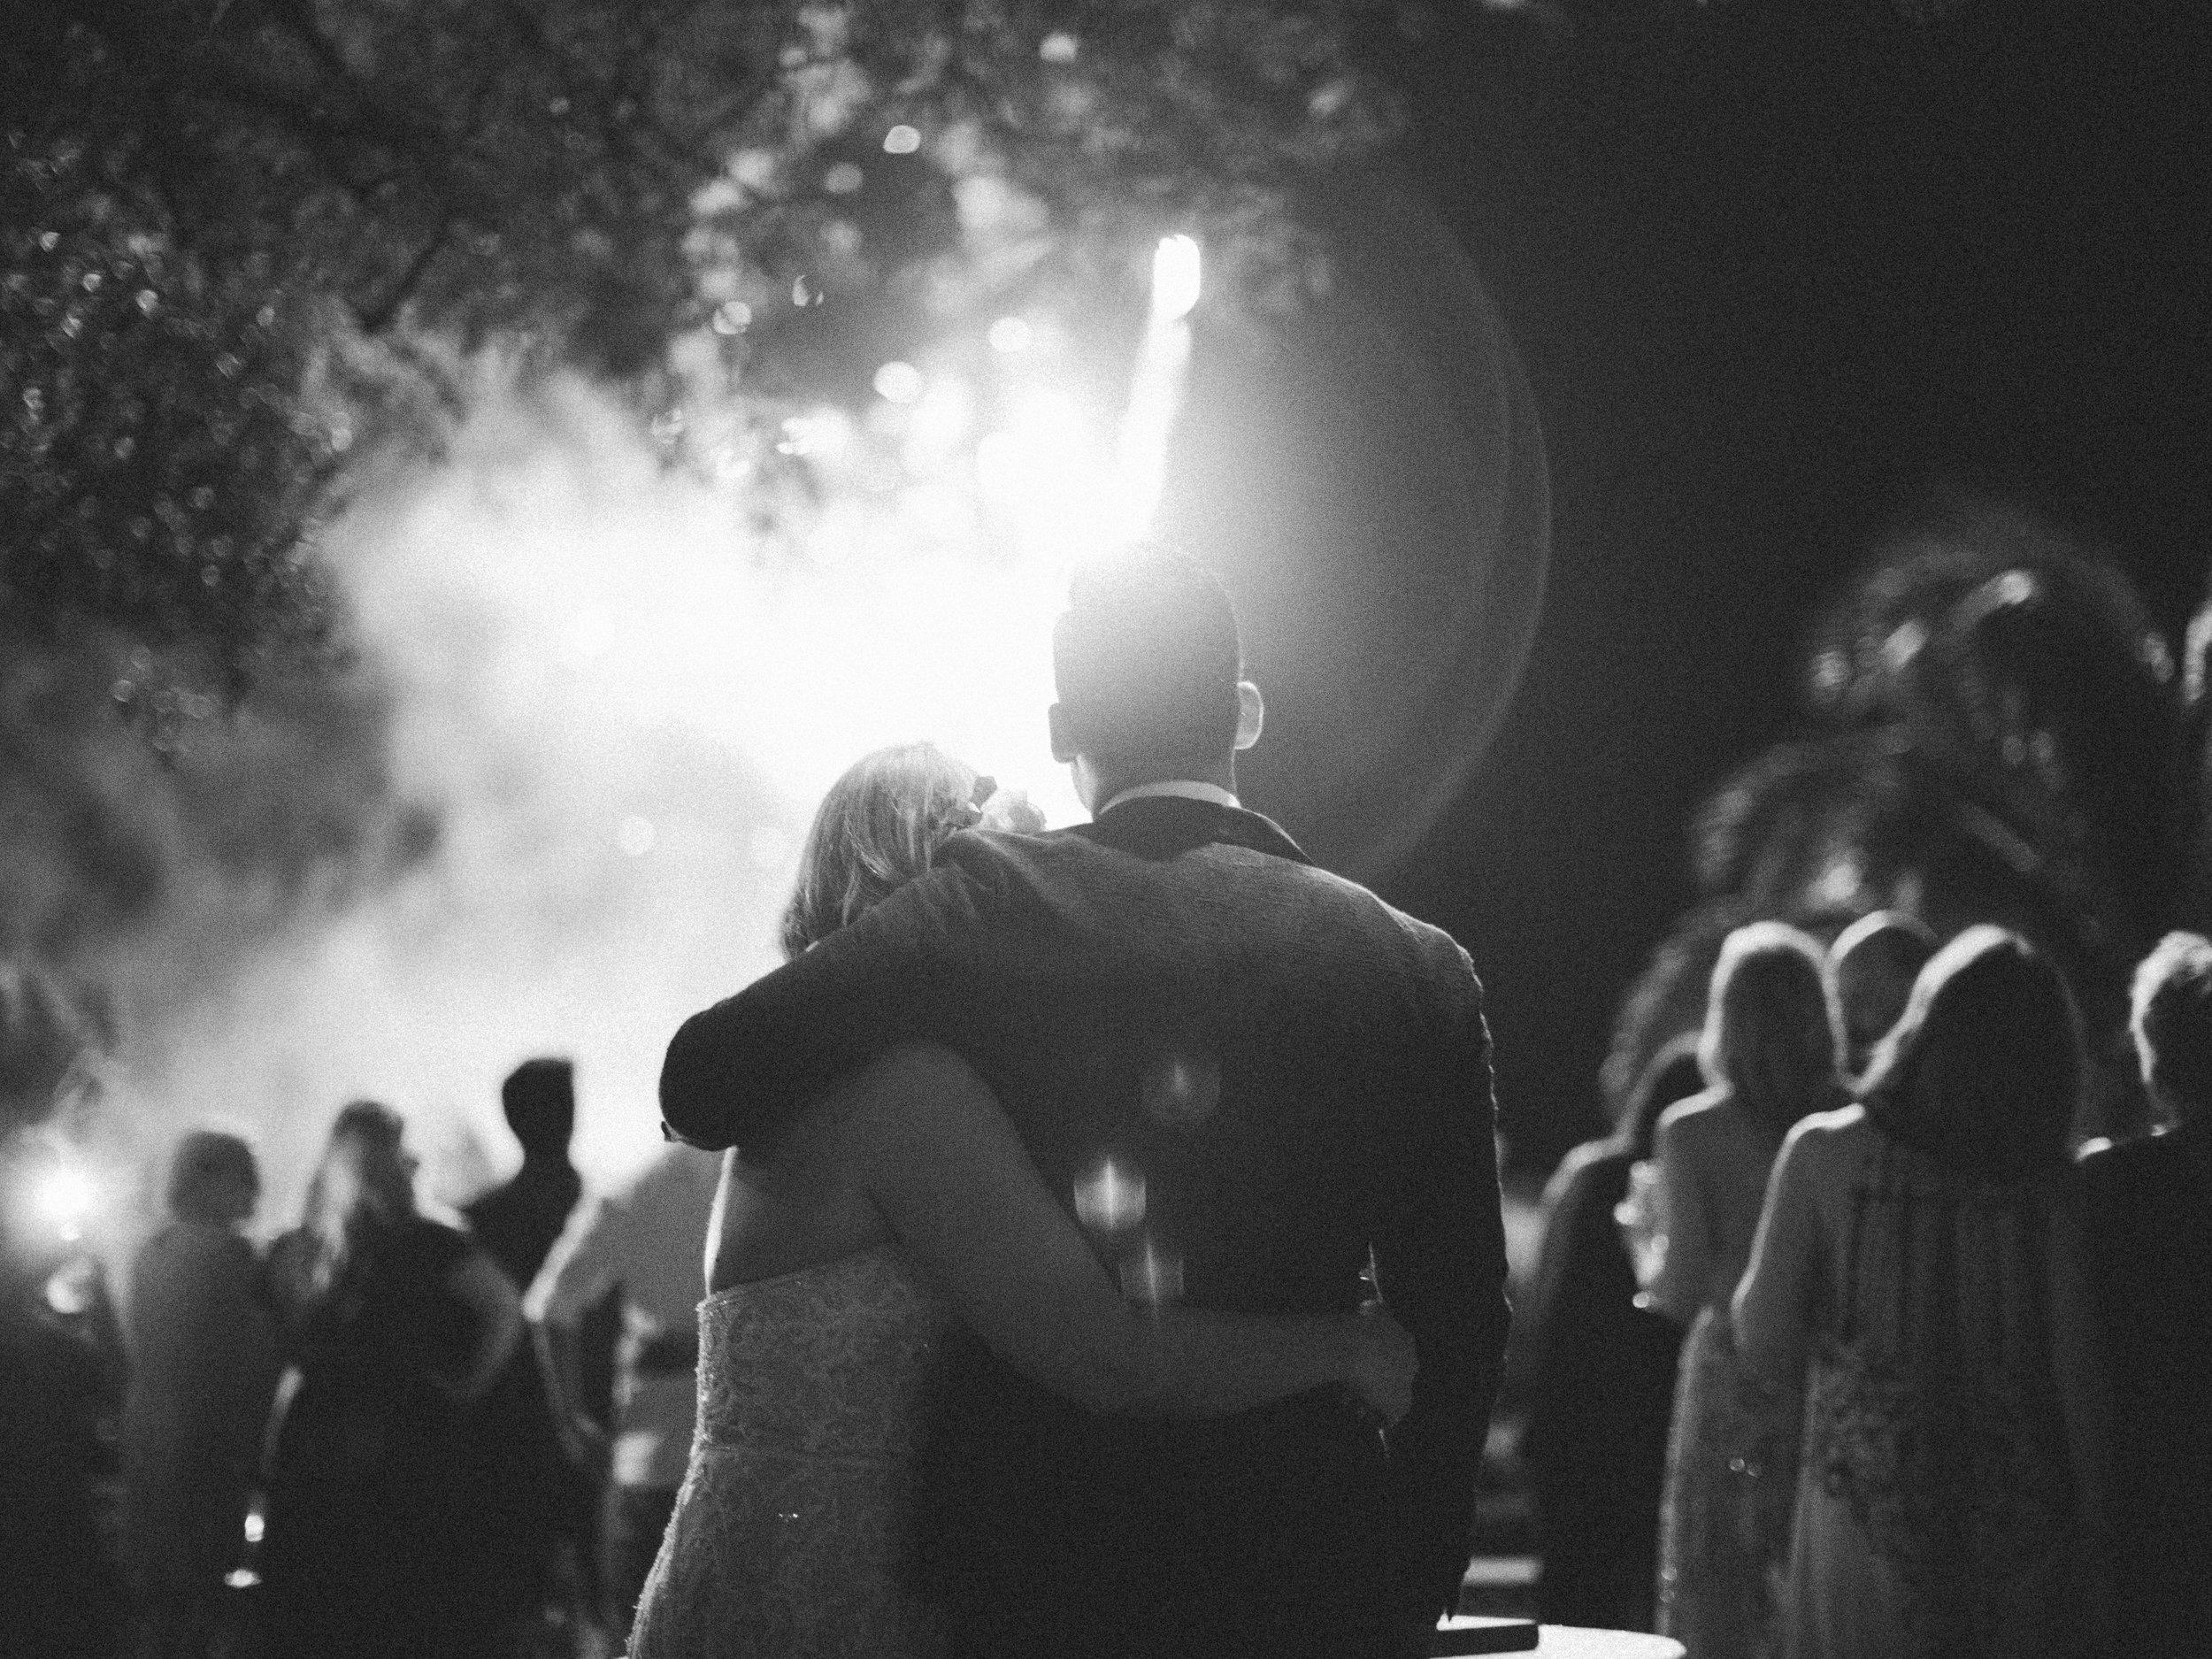 667-fine-art-film-photographer-destination-wedding-nicaragua-jacob+cammye-brumley & wells.jpg